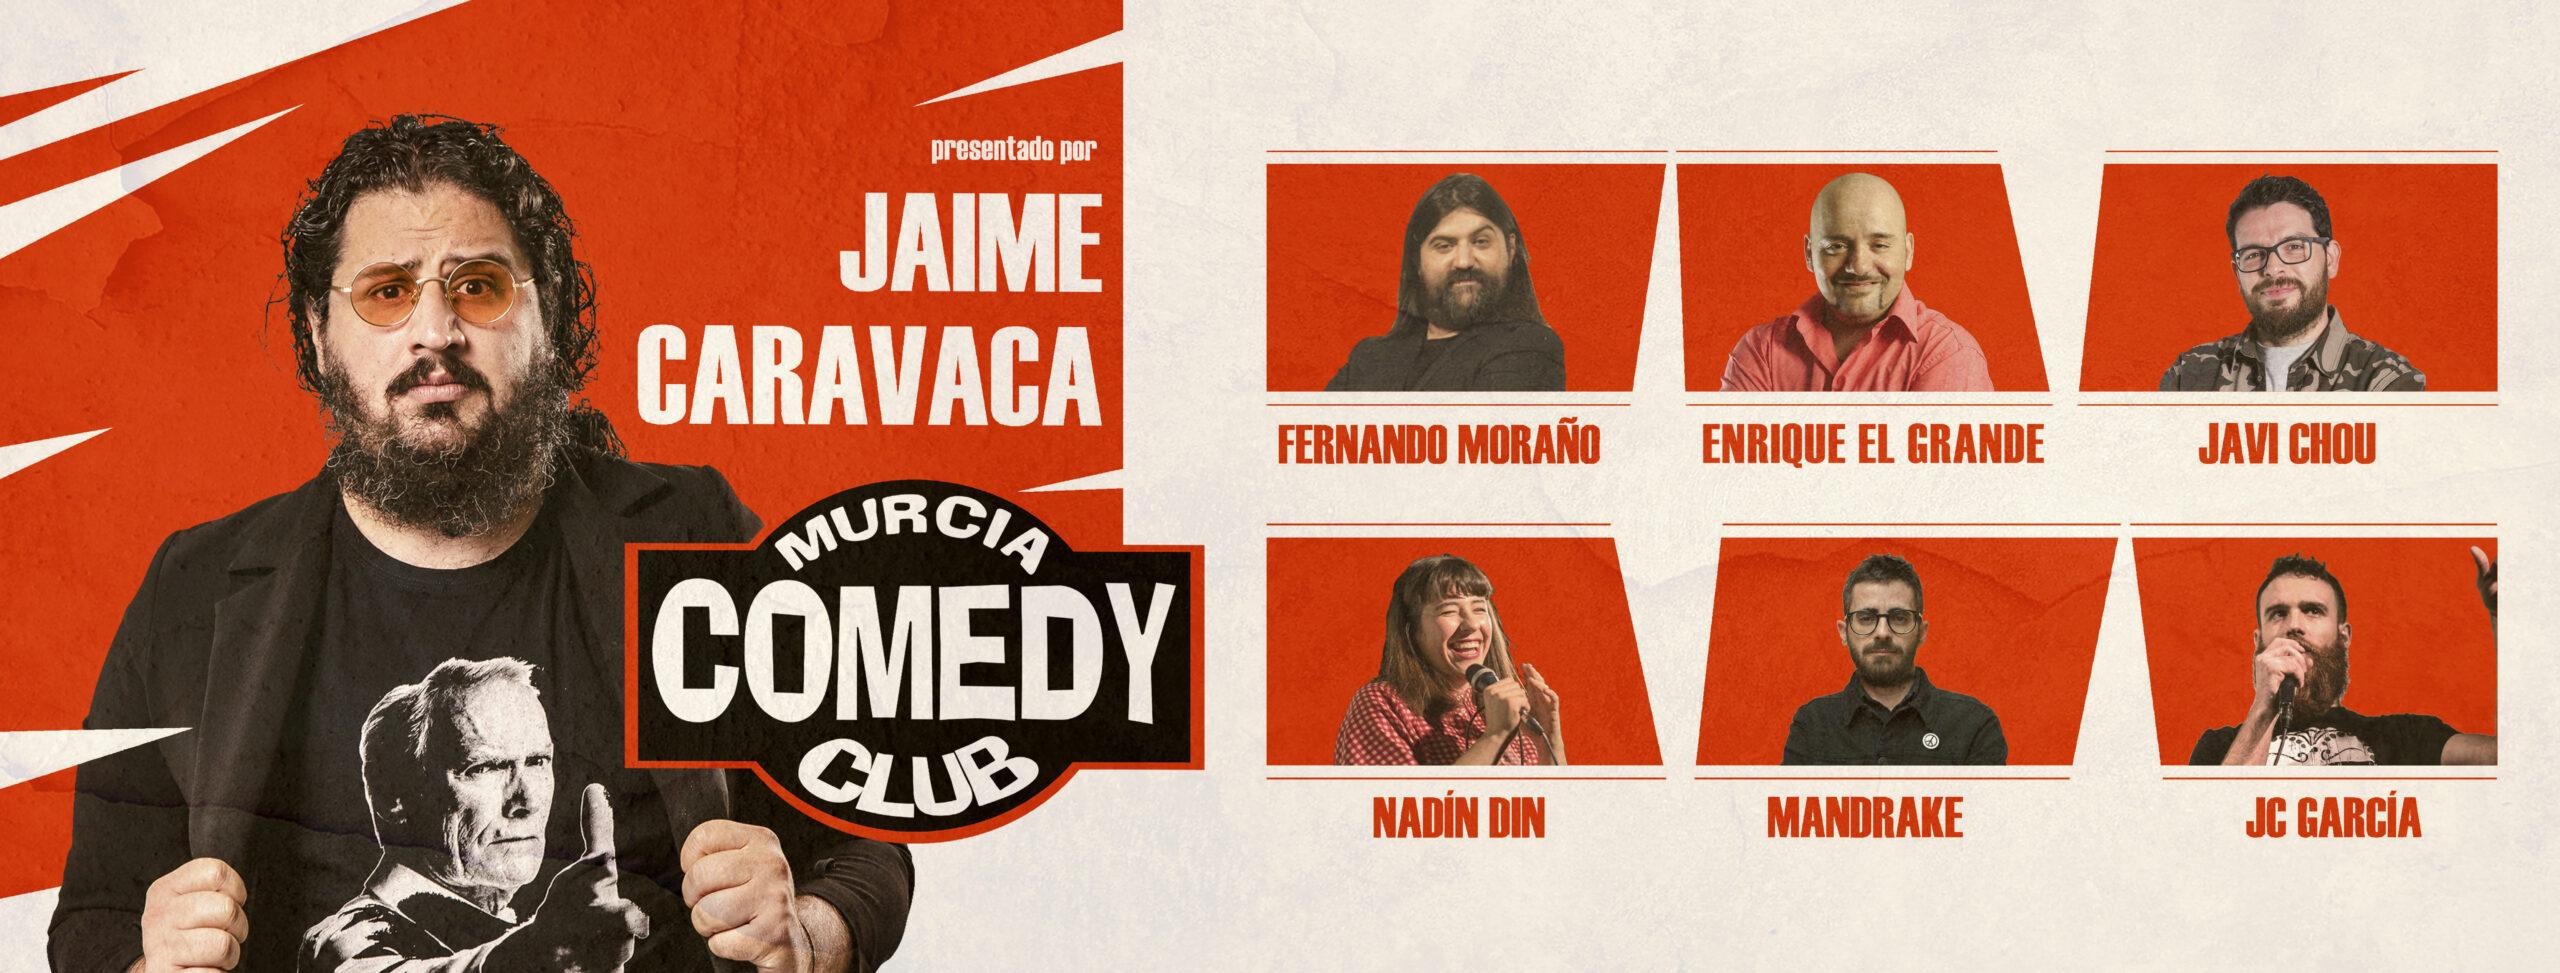 Murcia Comedy Club 7 mayo